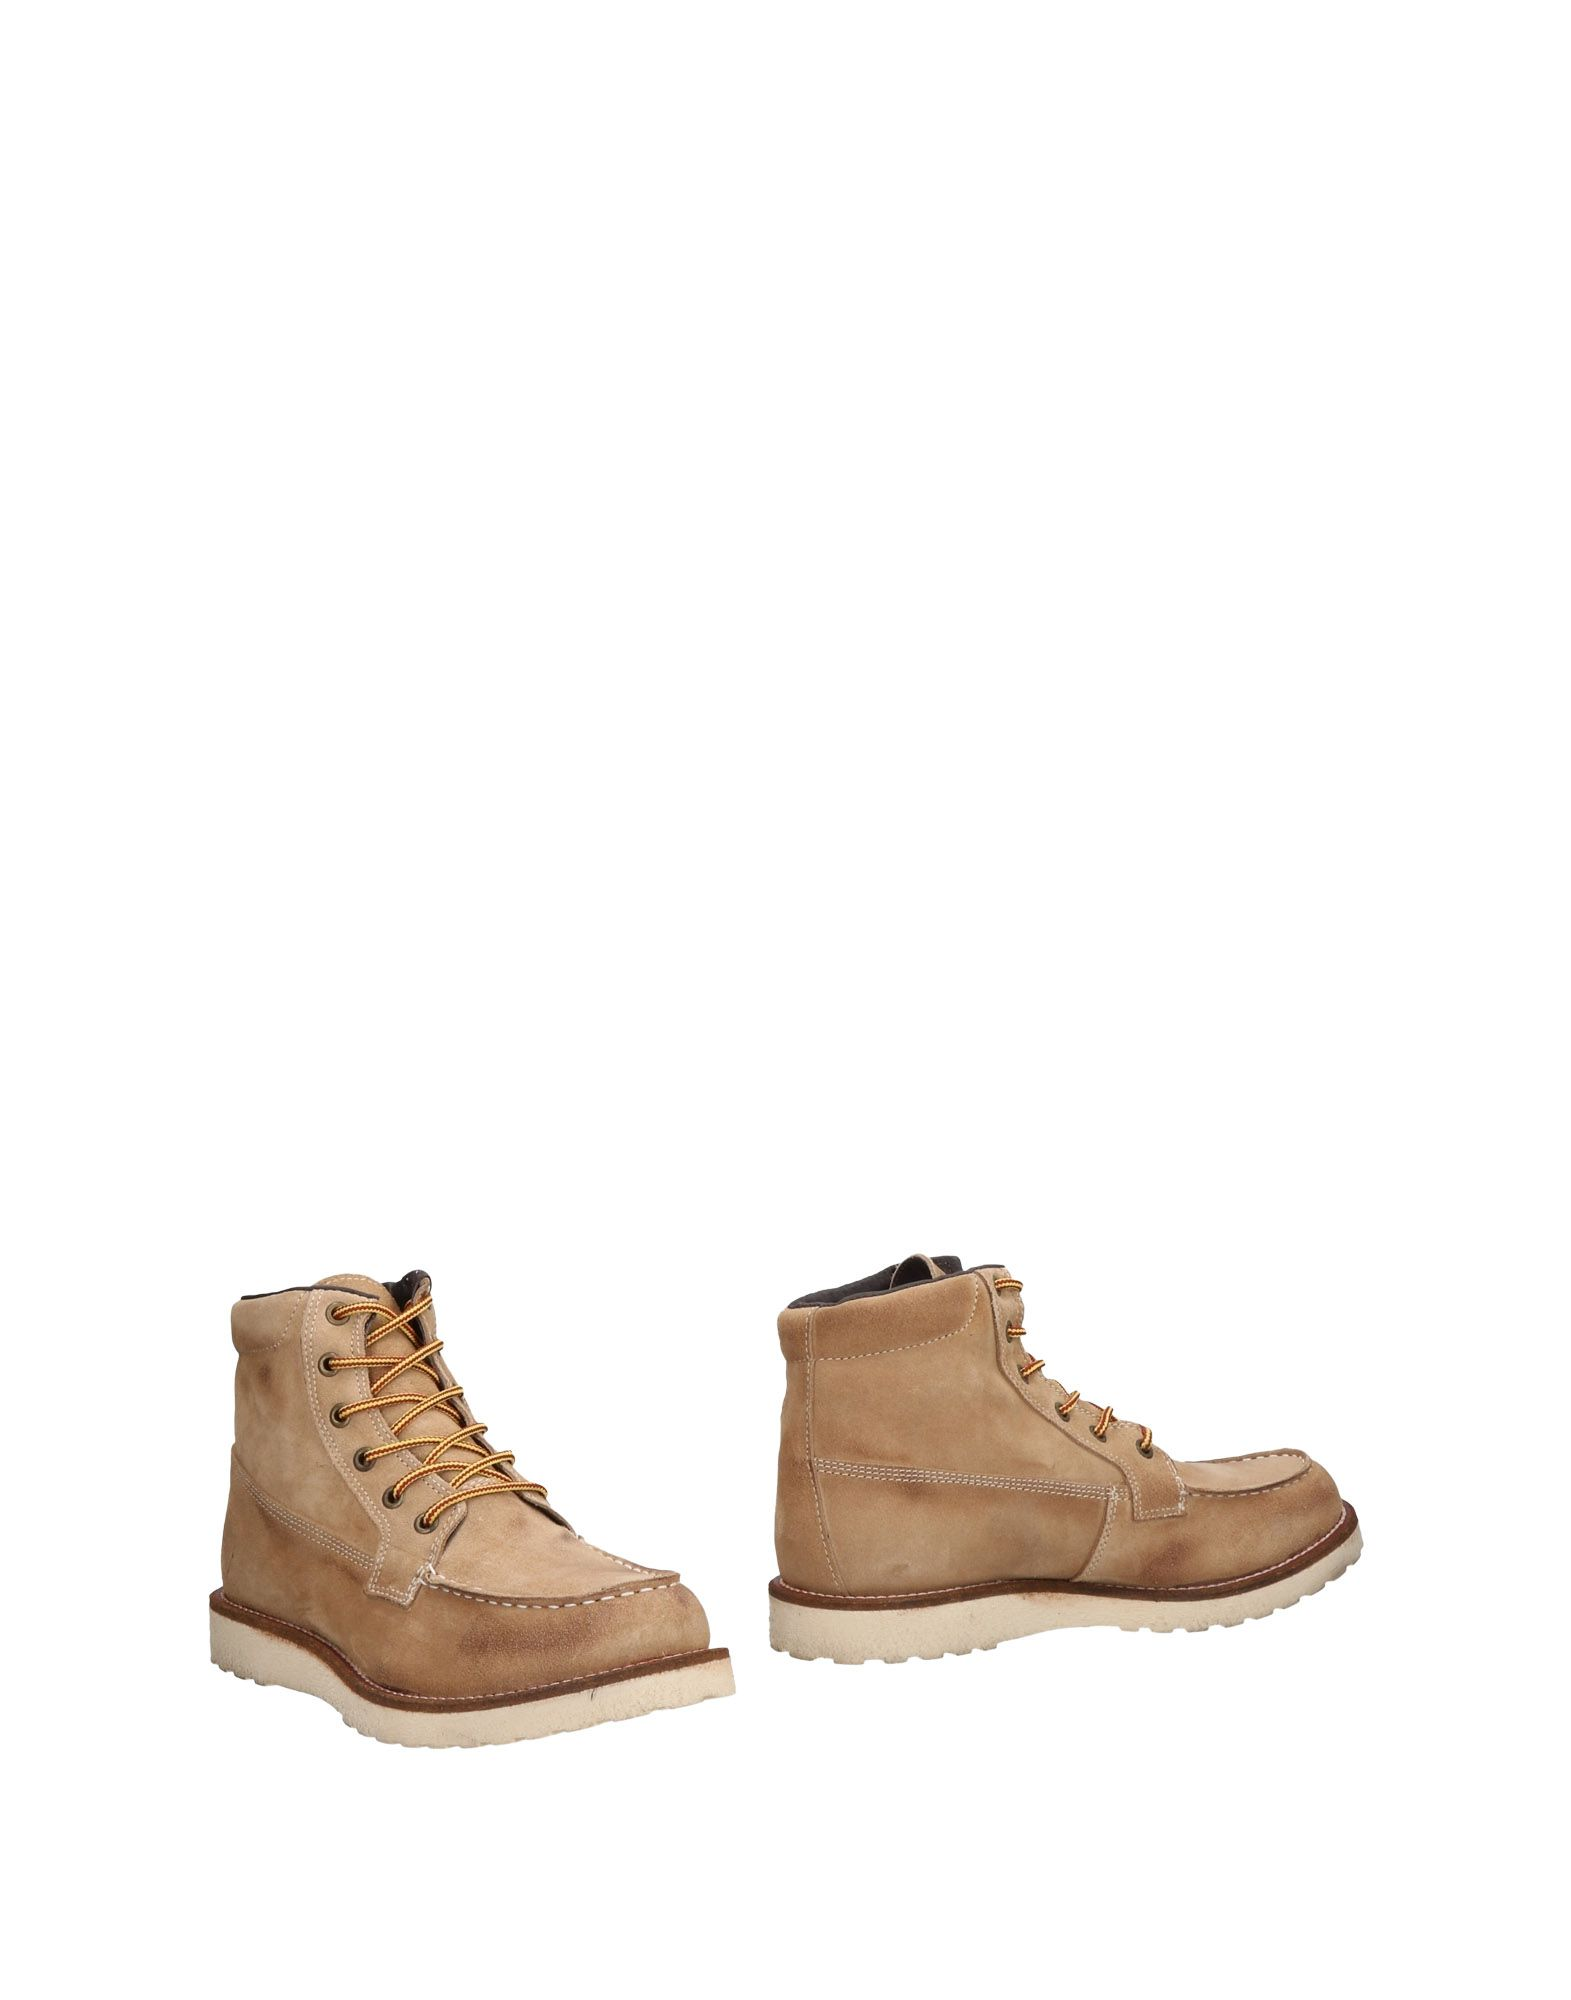 11468753AI Selected Stiefelette Herren  11468753AI  Heiße Schuhe aa7238